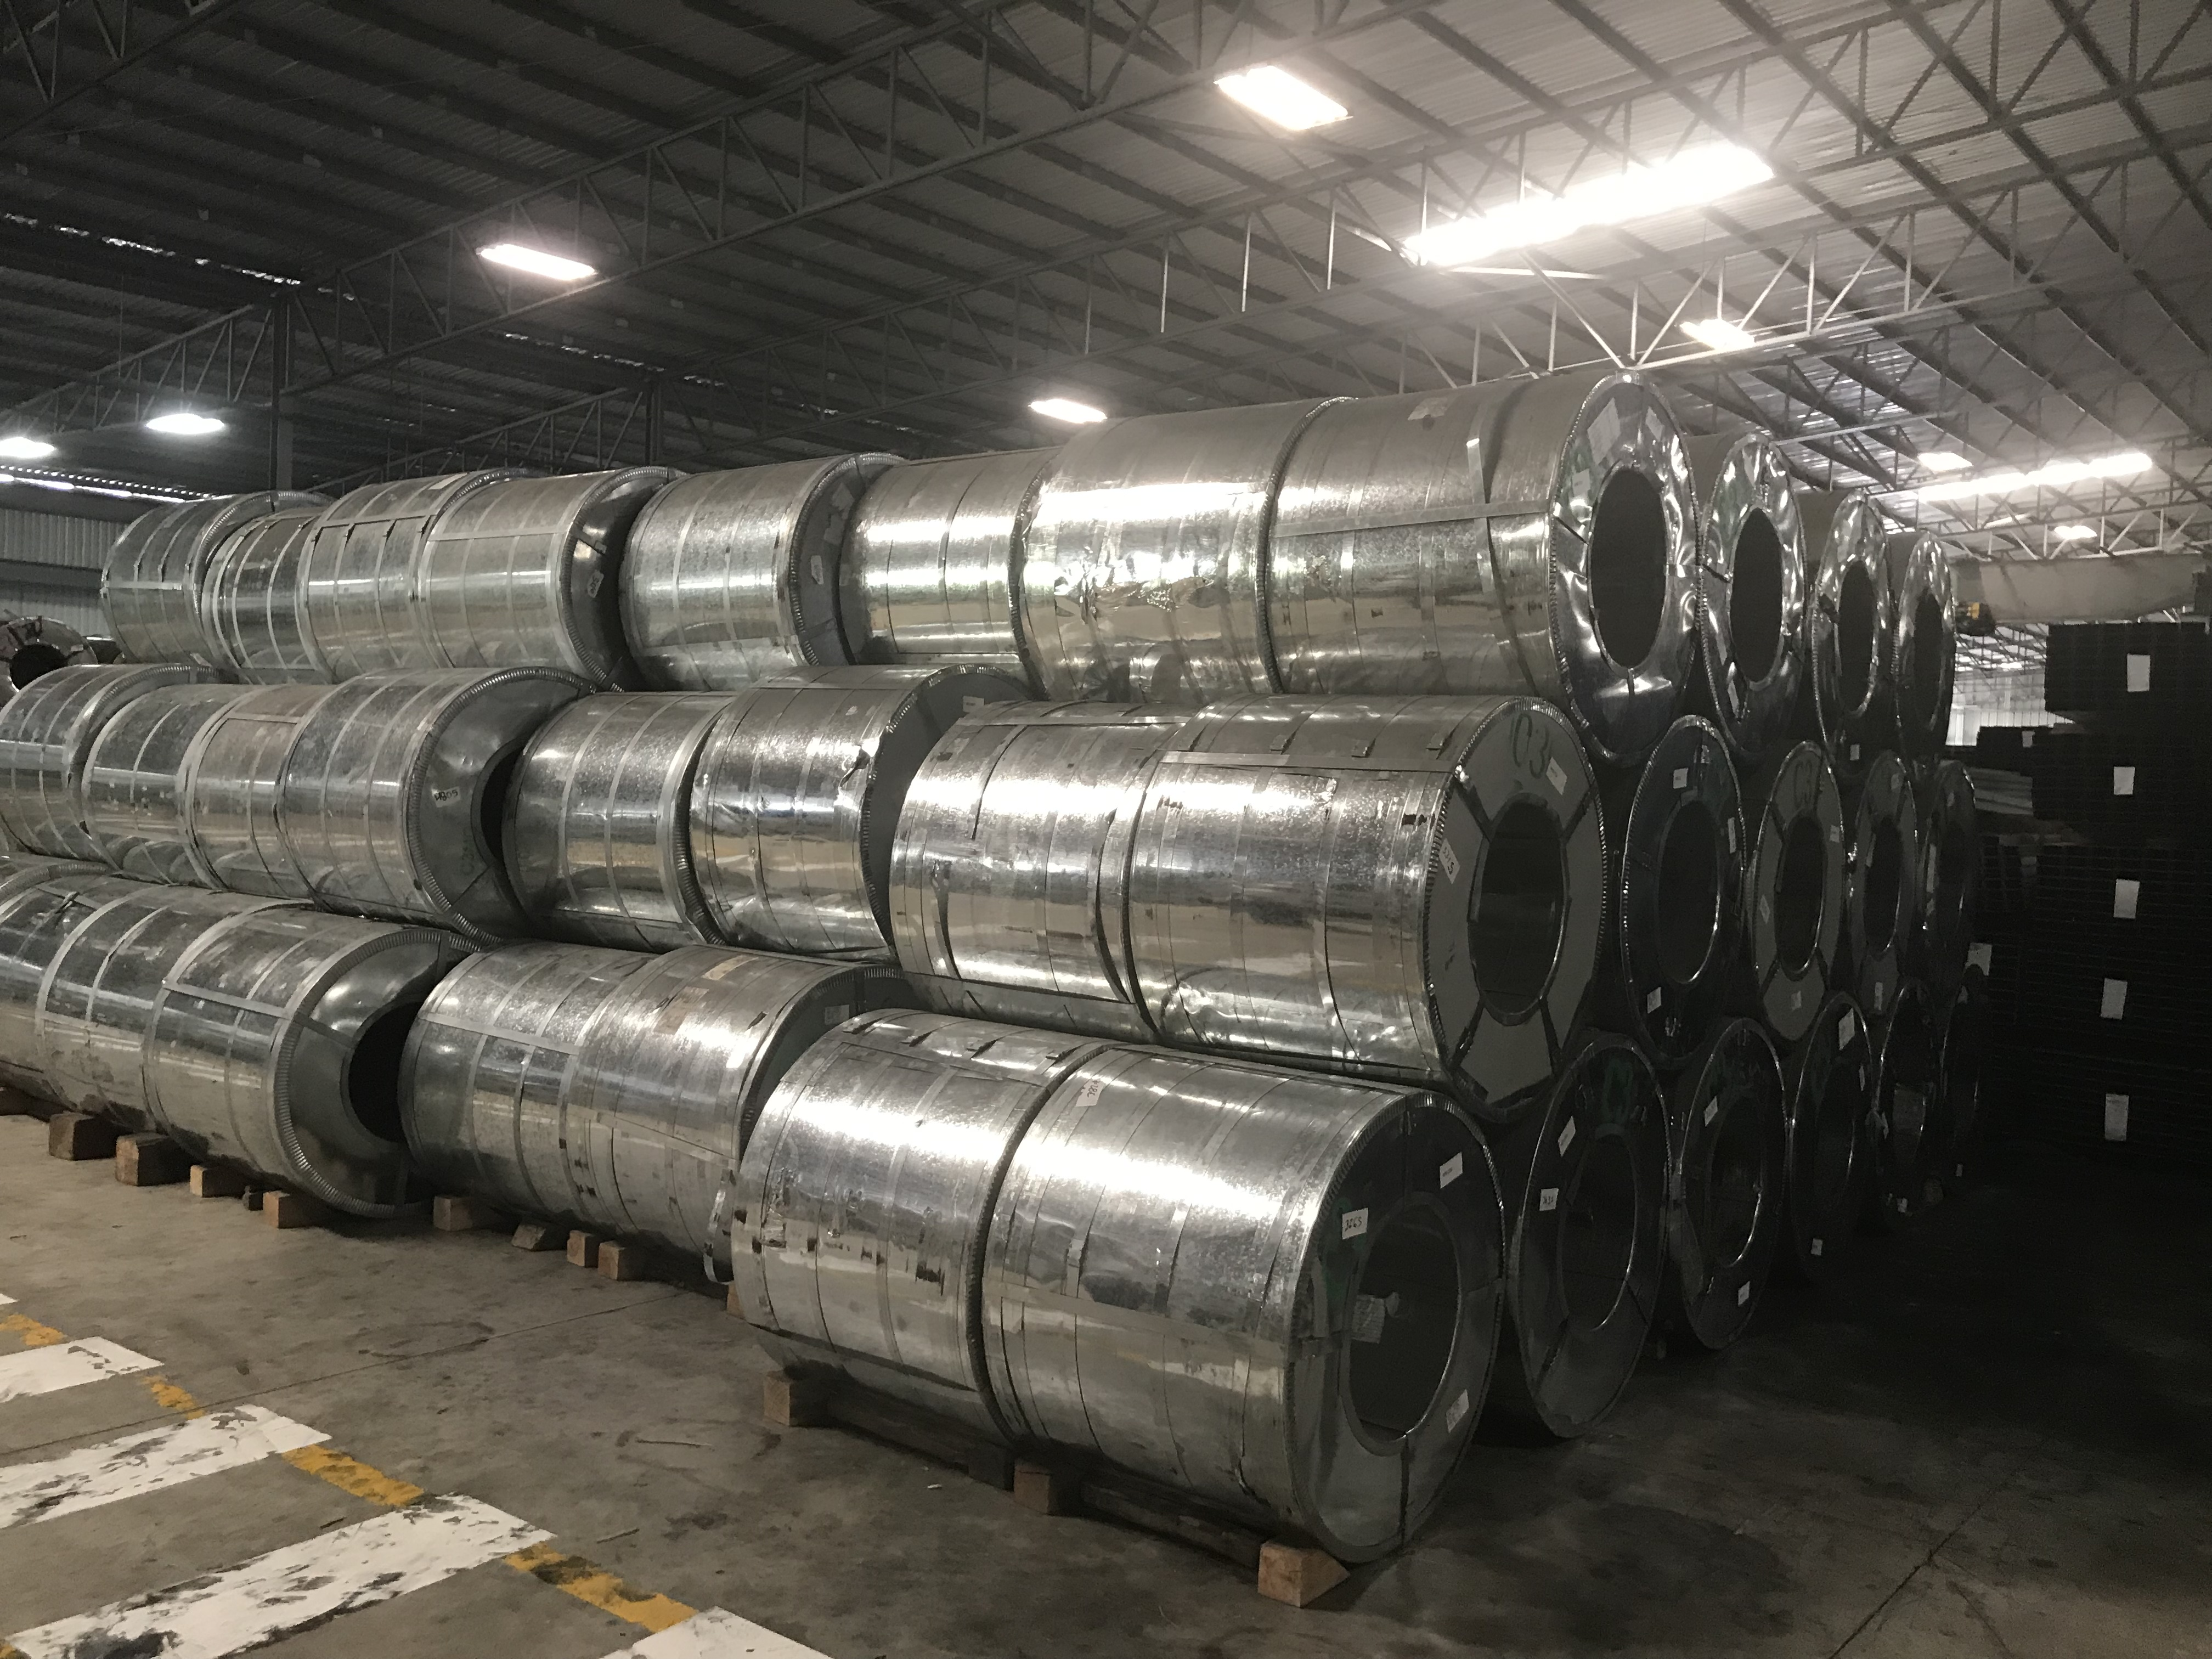 File:Leeco Steel exported steel coils to Honduras - Antonio Rosset